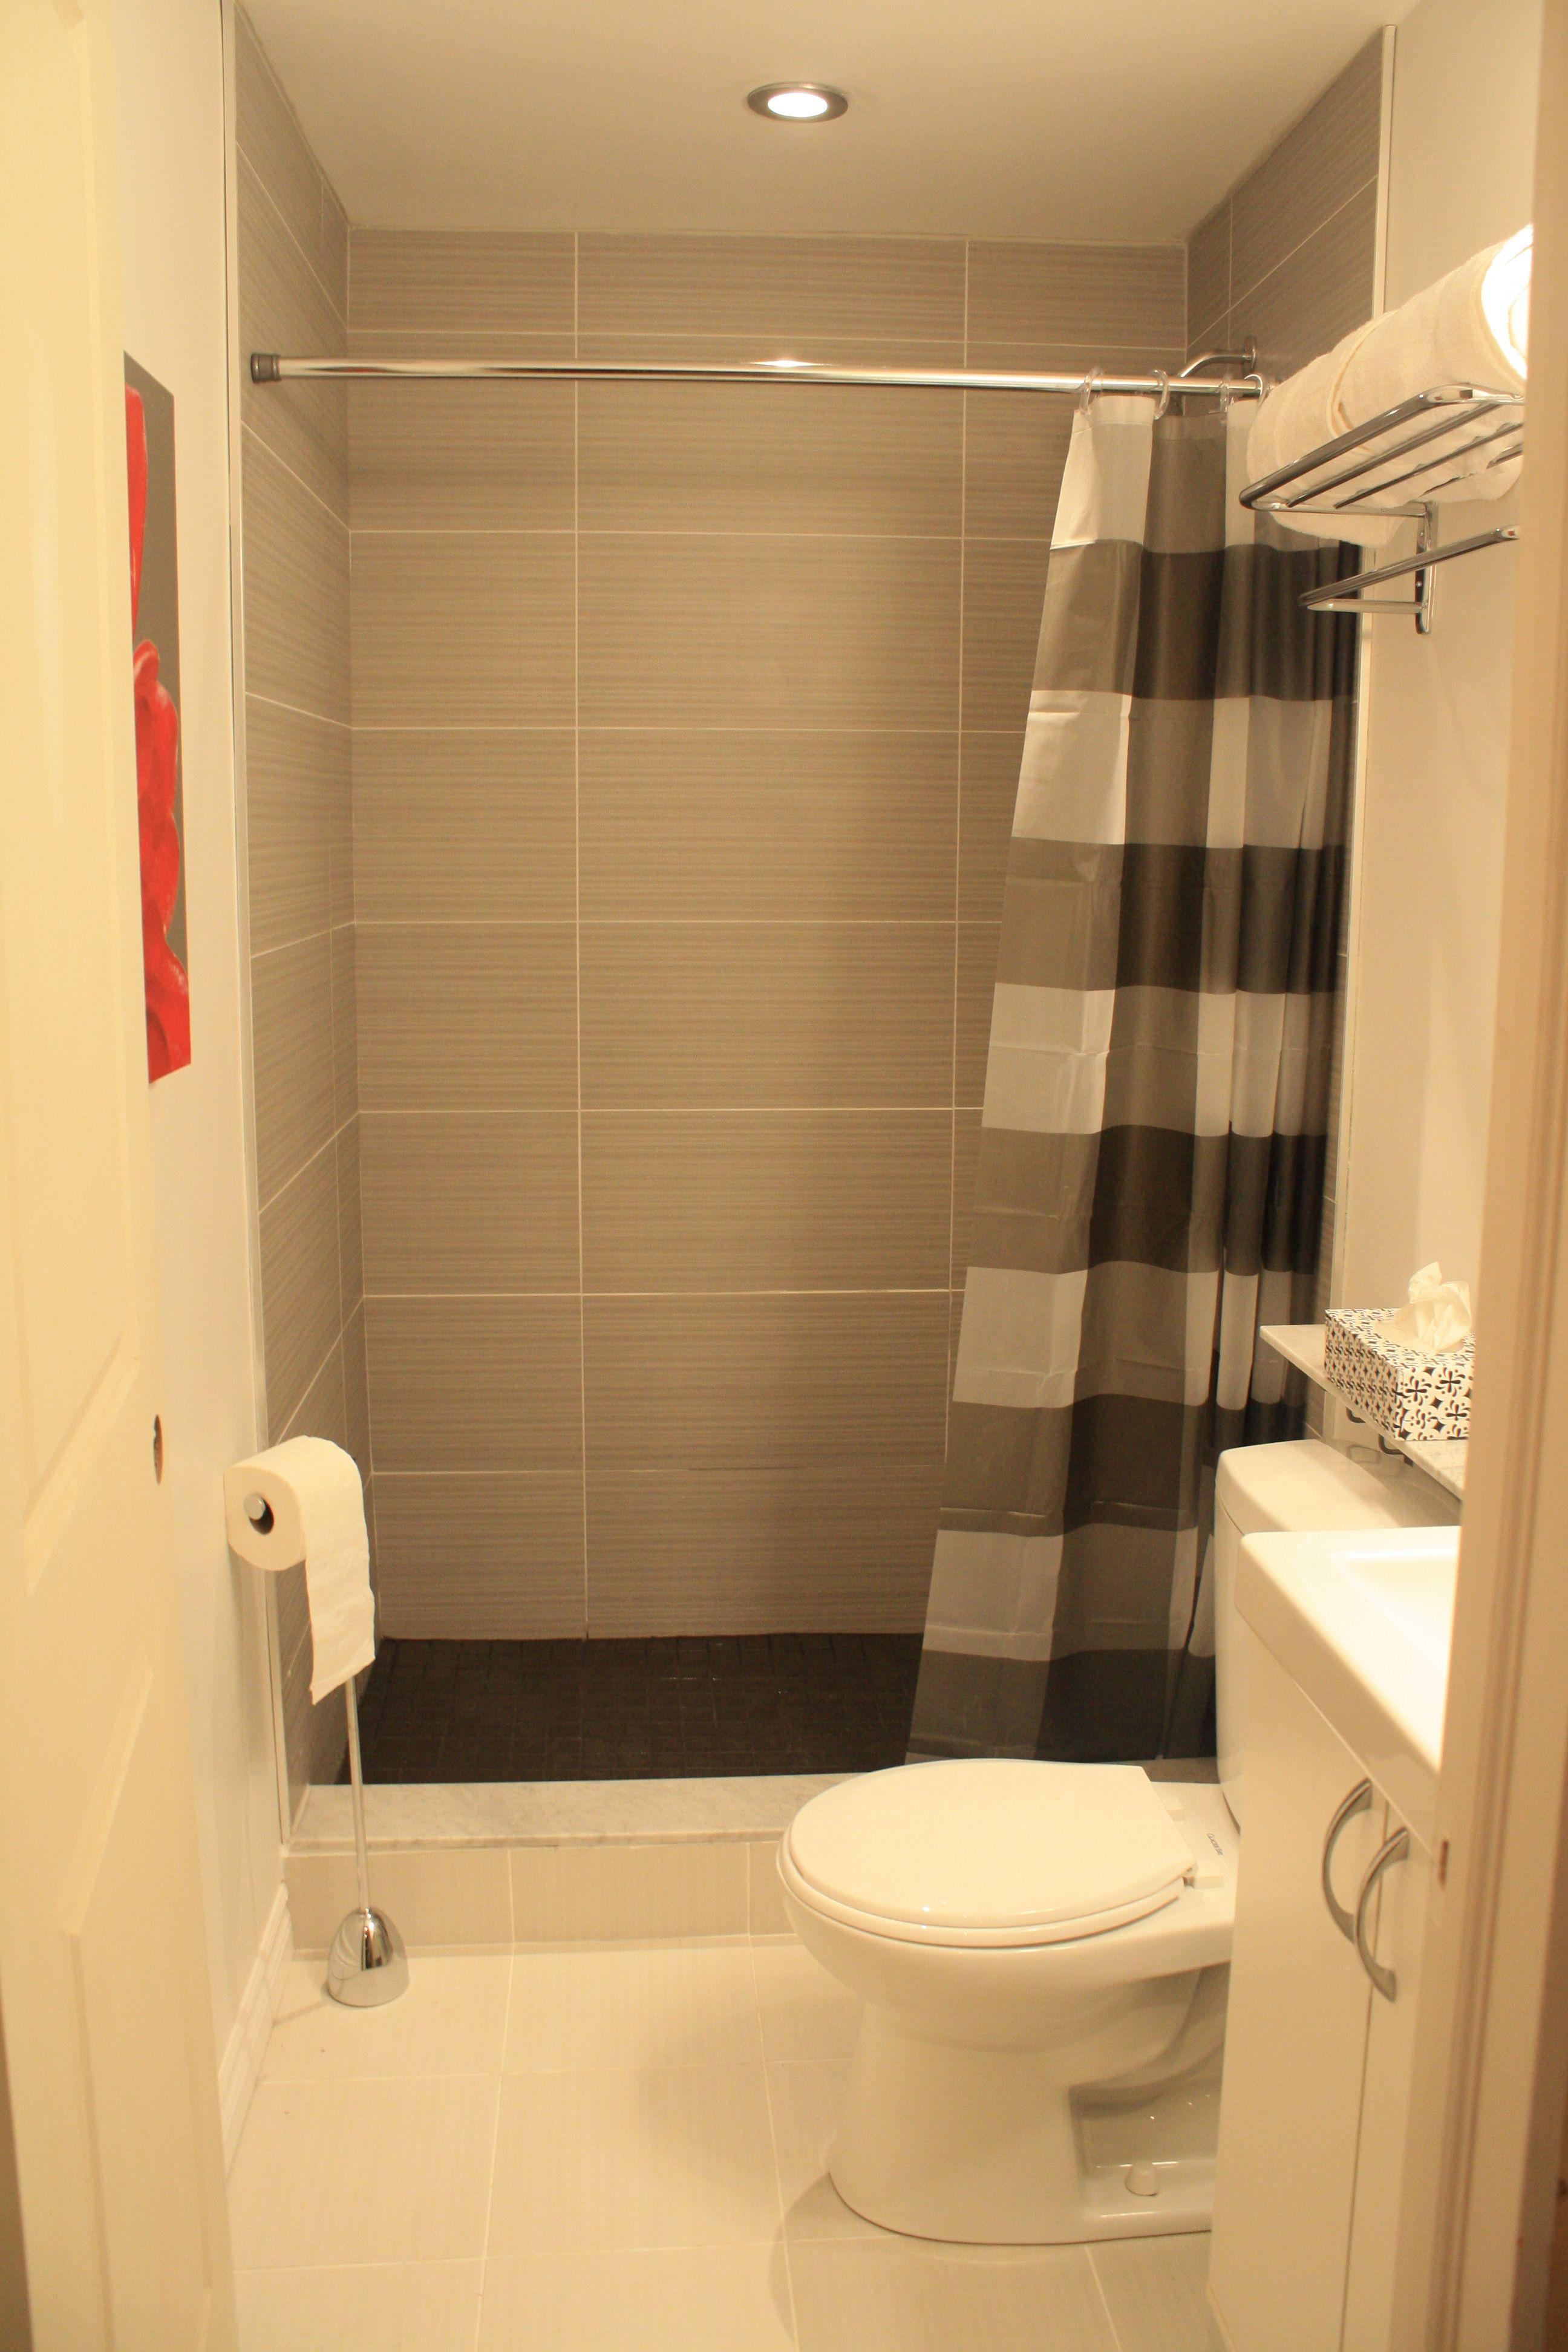 Small Space Bathroom | Small space bathroom design, Small ... on Small Space Small Bathroom Ideas Small Space Toilet Design id=19836